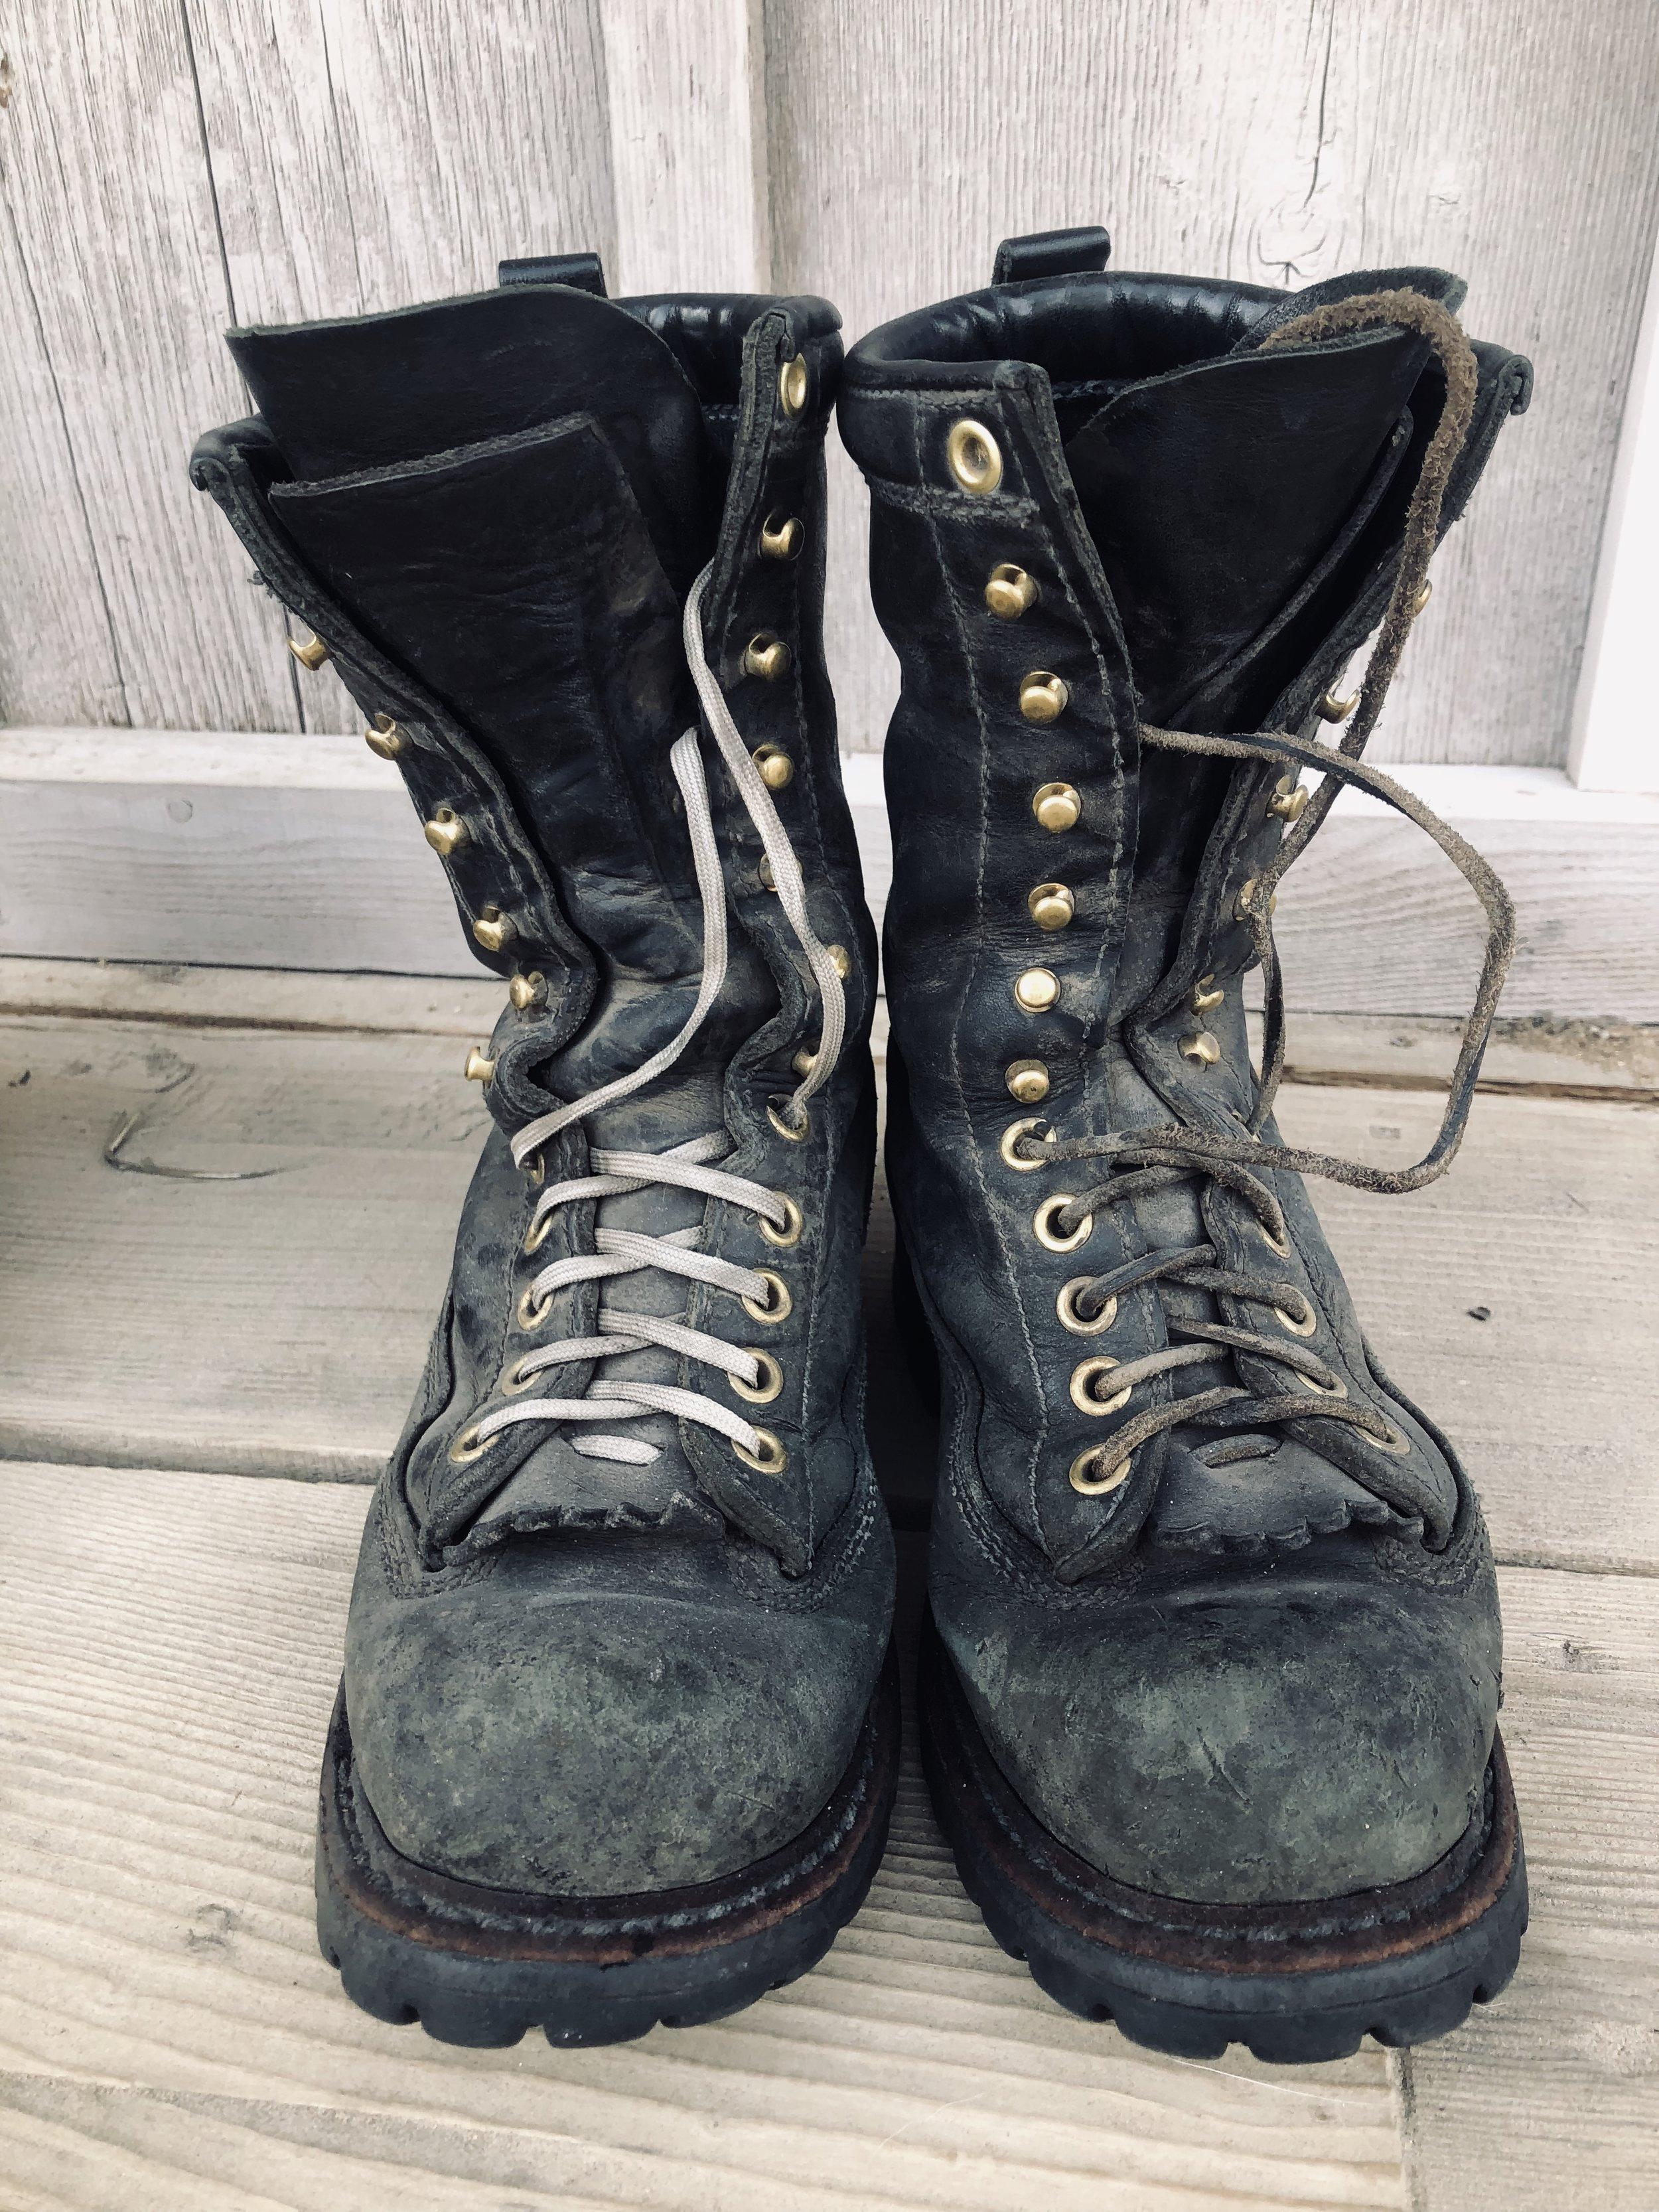 My White's Hathorn Explorers. Parachute cord makes excellent shoe laces when the original leather ones snap.